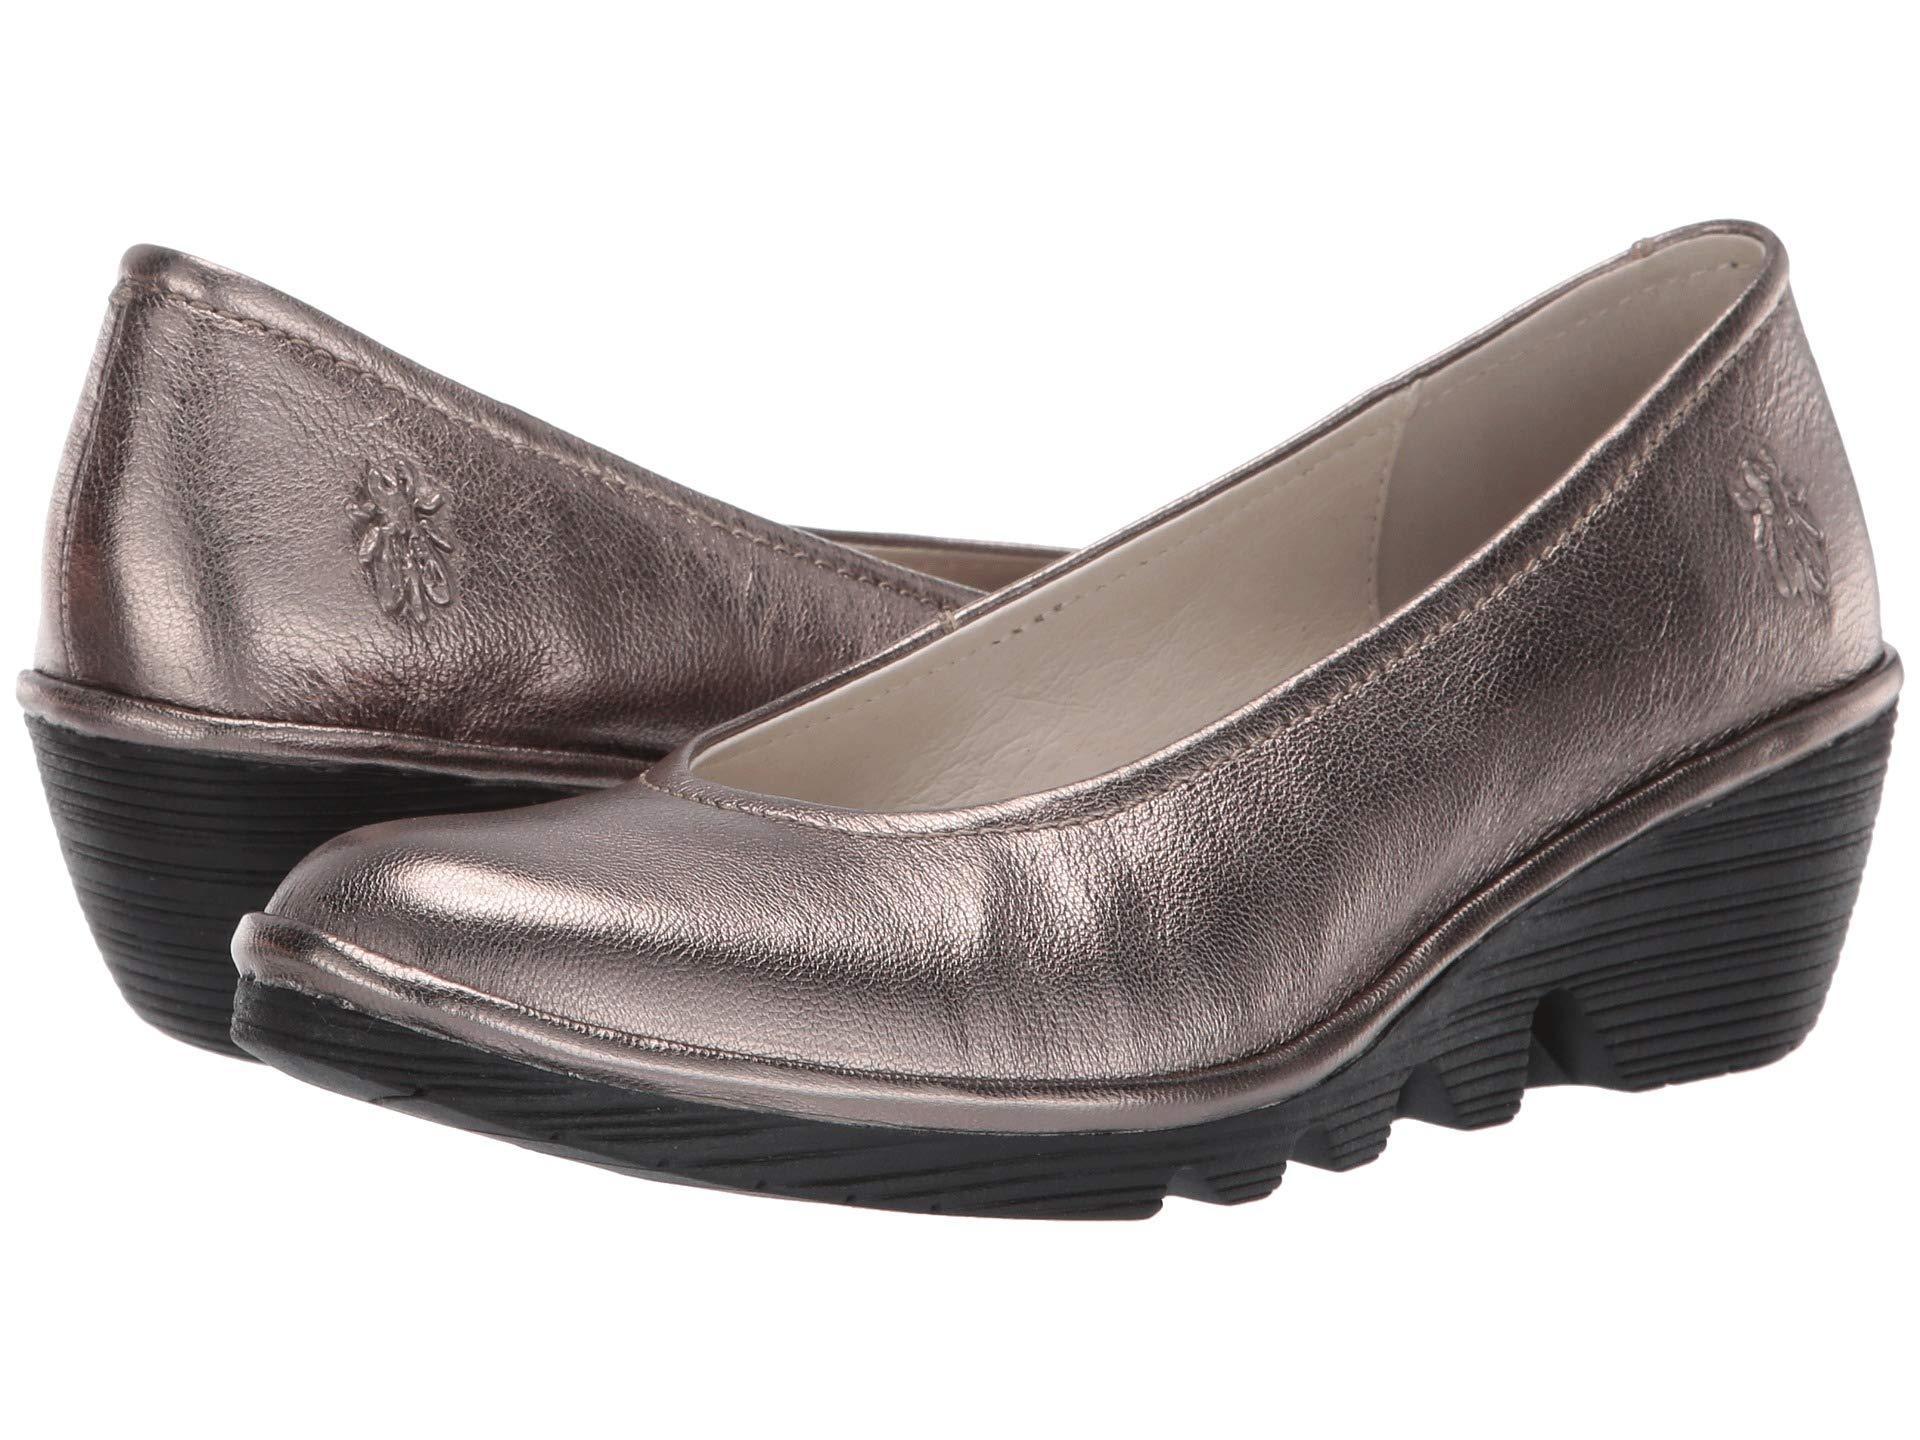 2ad150a8749cc Fly London Pump (black Mousse) Women's Wedge Shoes - Lyst